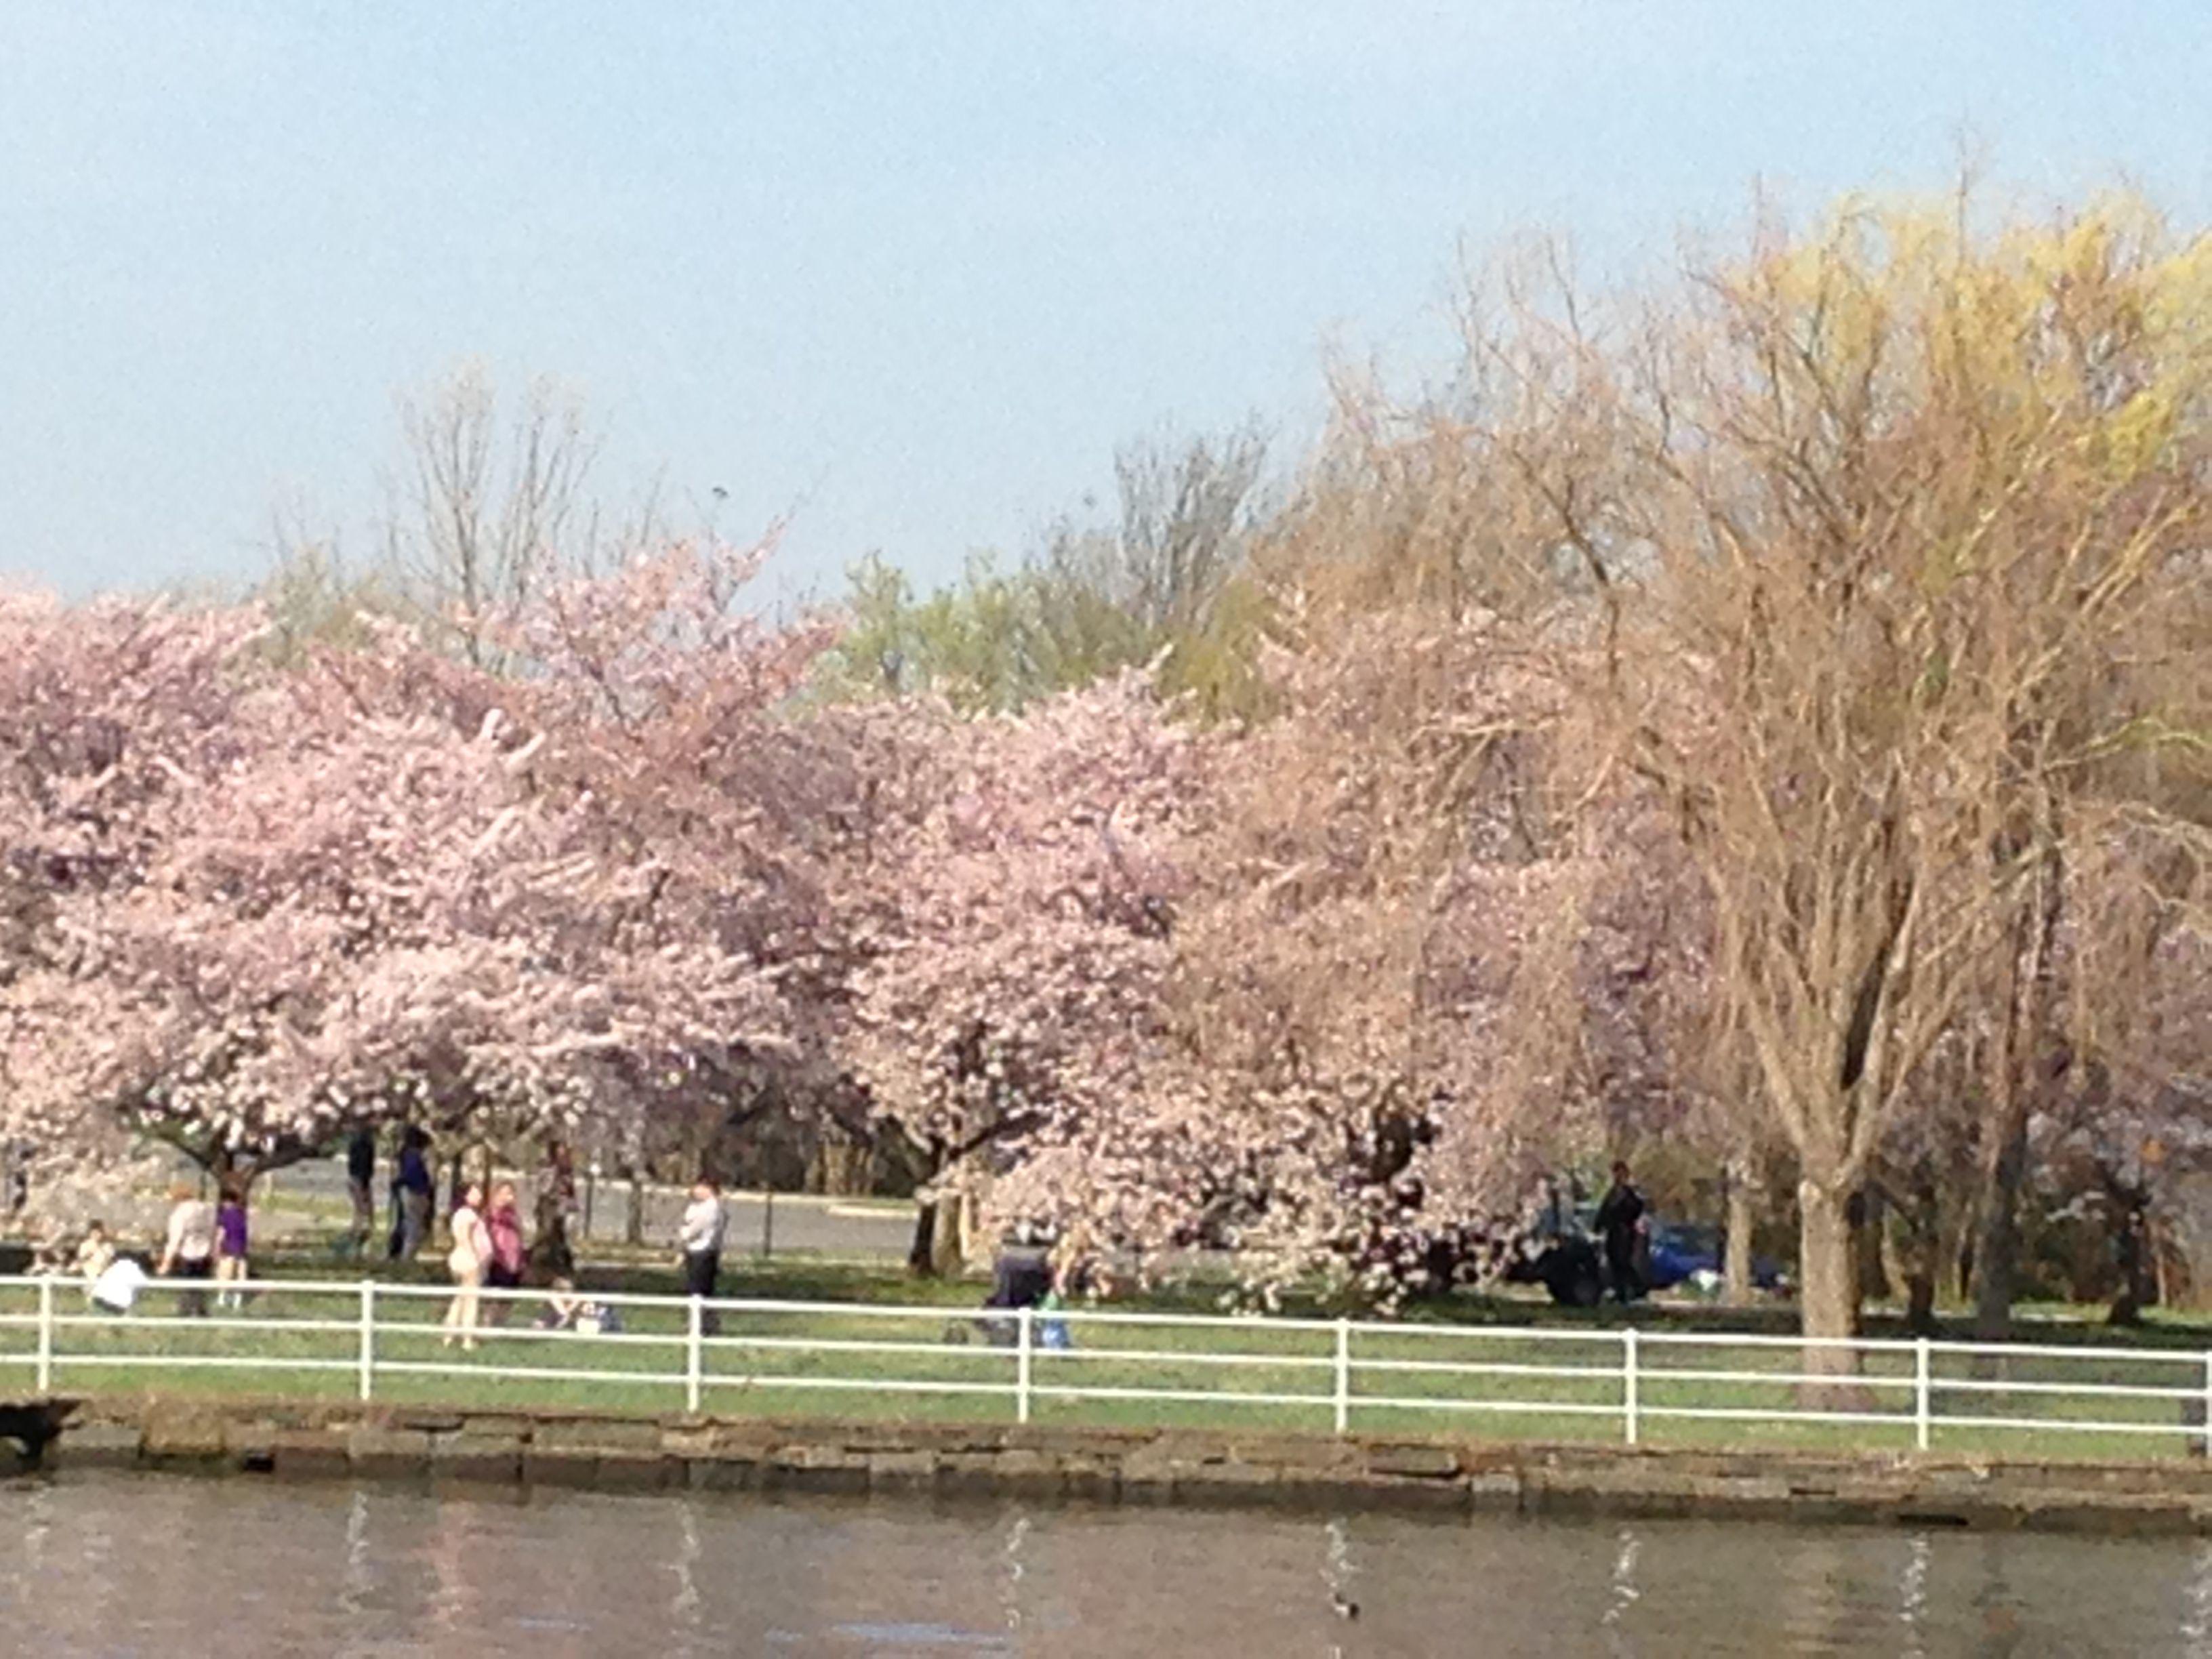 3 Day Washington Dc Cherry Blossom Amish Tour From Chicago Cherry Blossom Tour Cherry Blossom Korean War Veterans Memorial